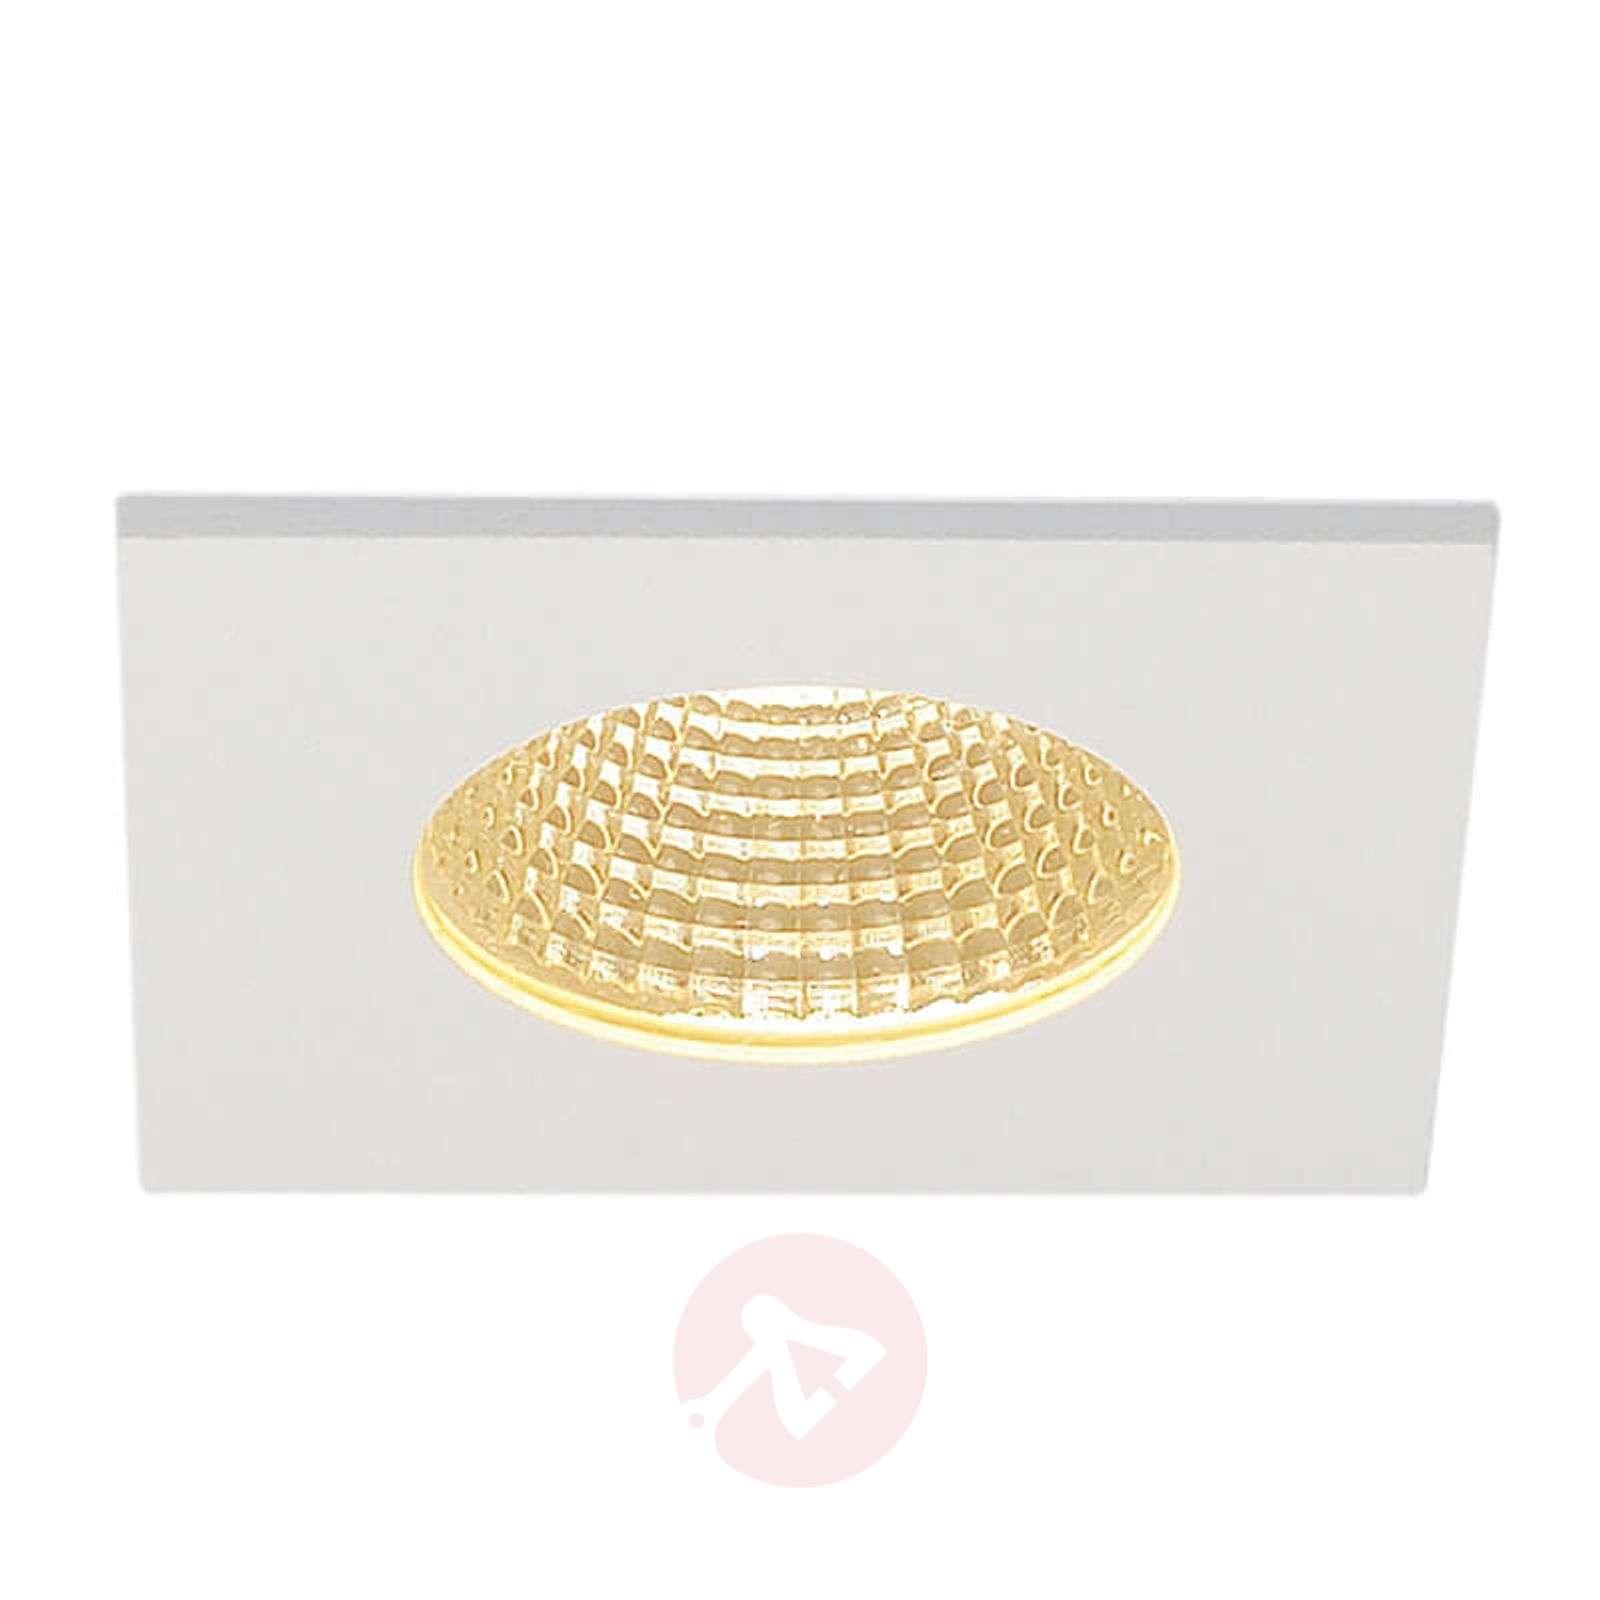 SLV Patta I LED recessed light, angular matt white-5504796-01